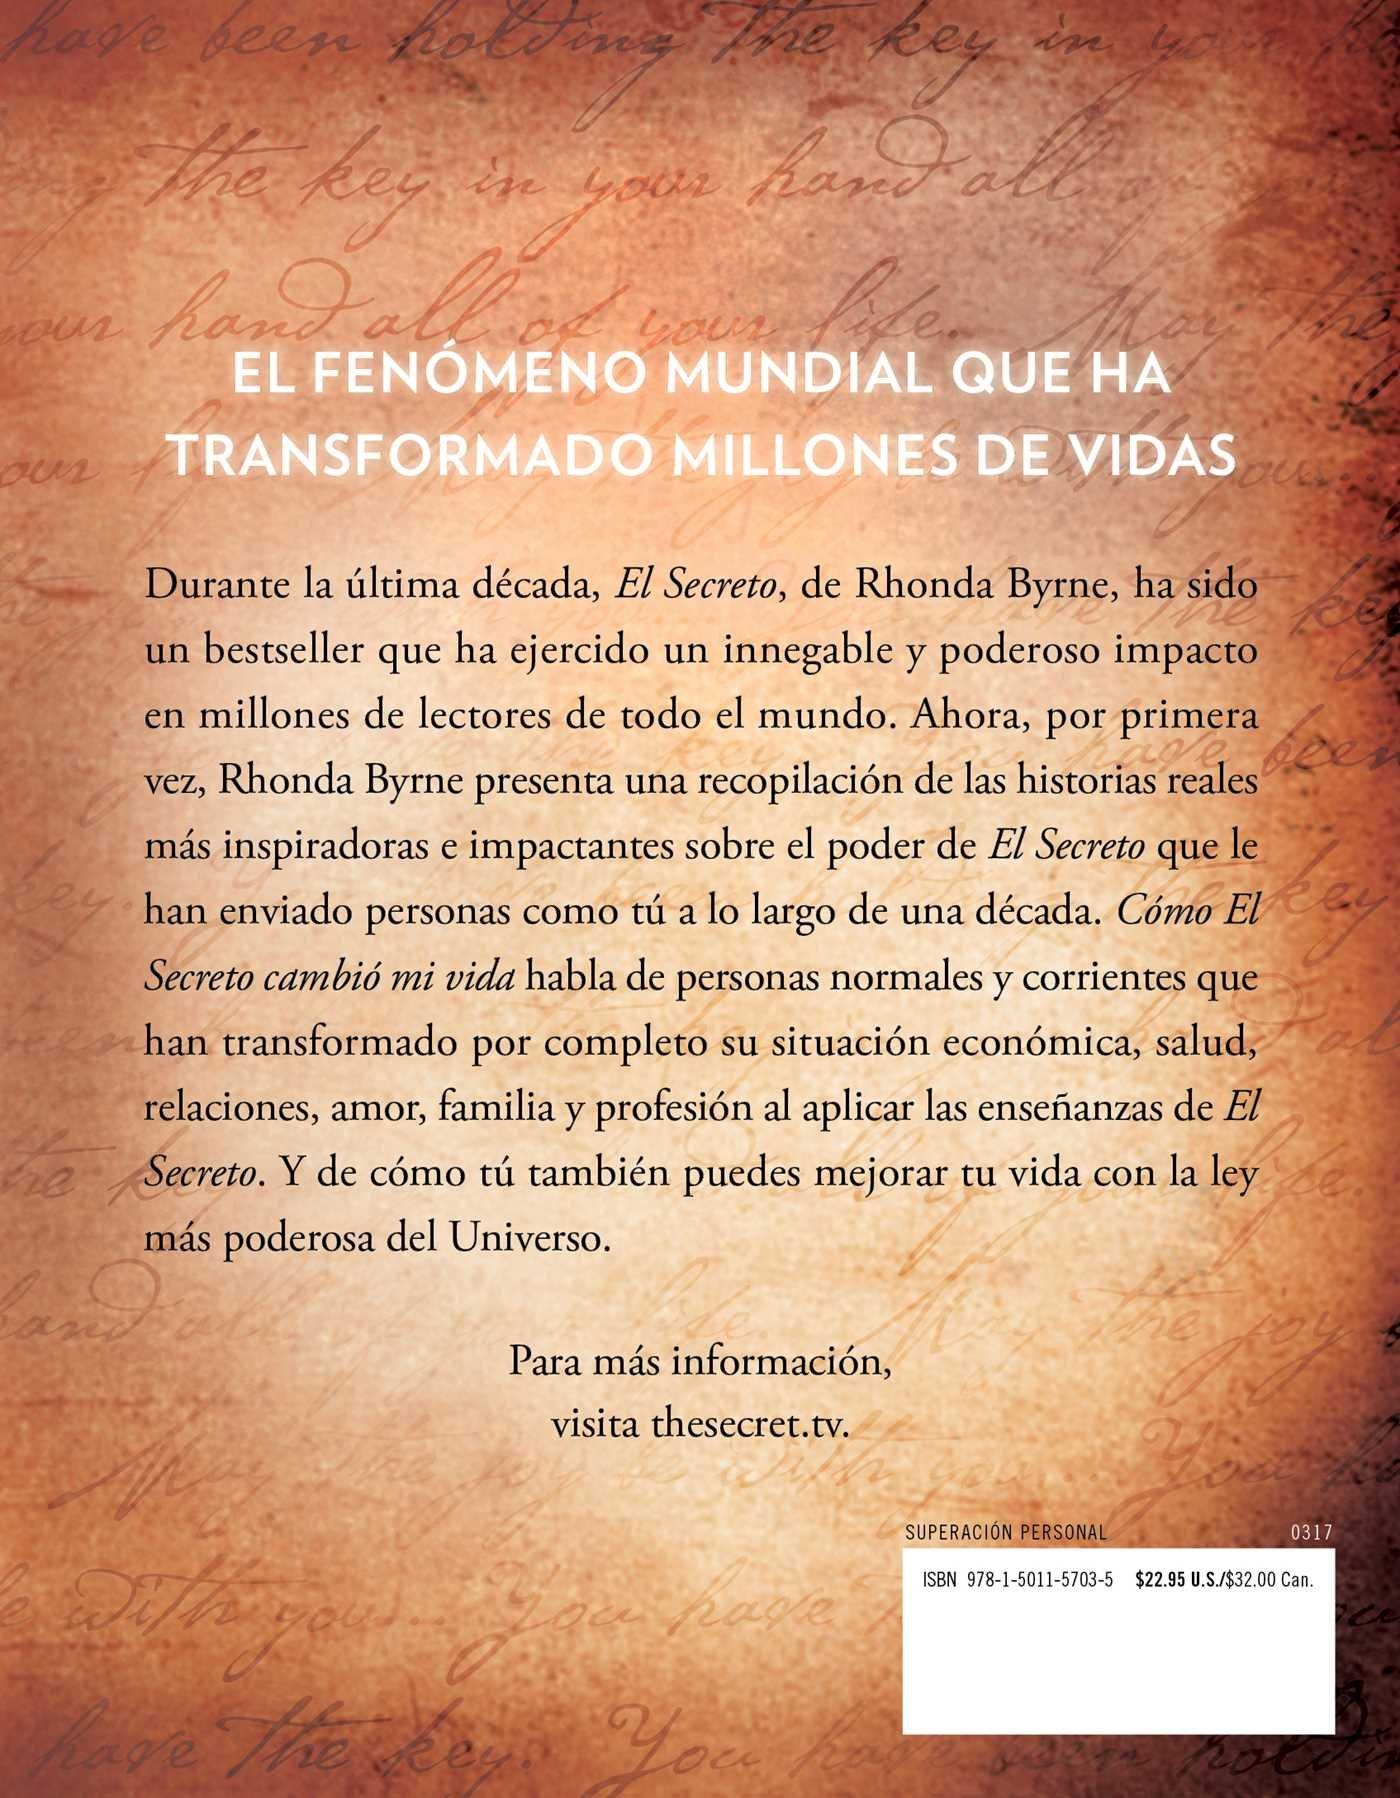 C mo el secreto cambi mi vida how the secret changed my life spanish edition gente real historias reales atria espanol rhonda byrne 9781501157035